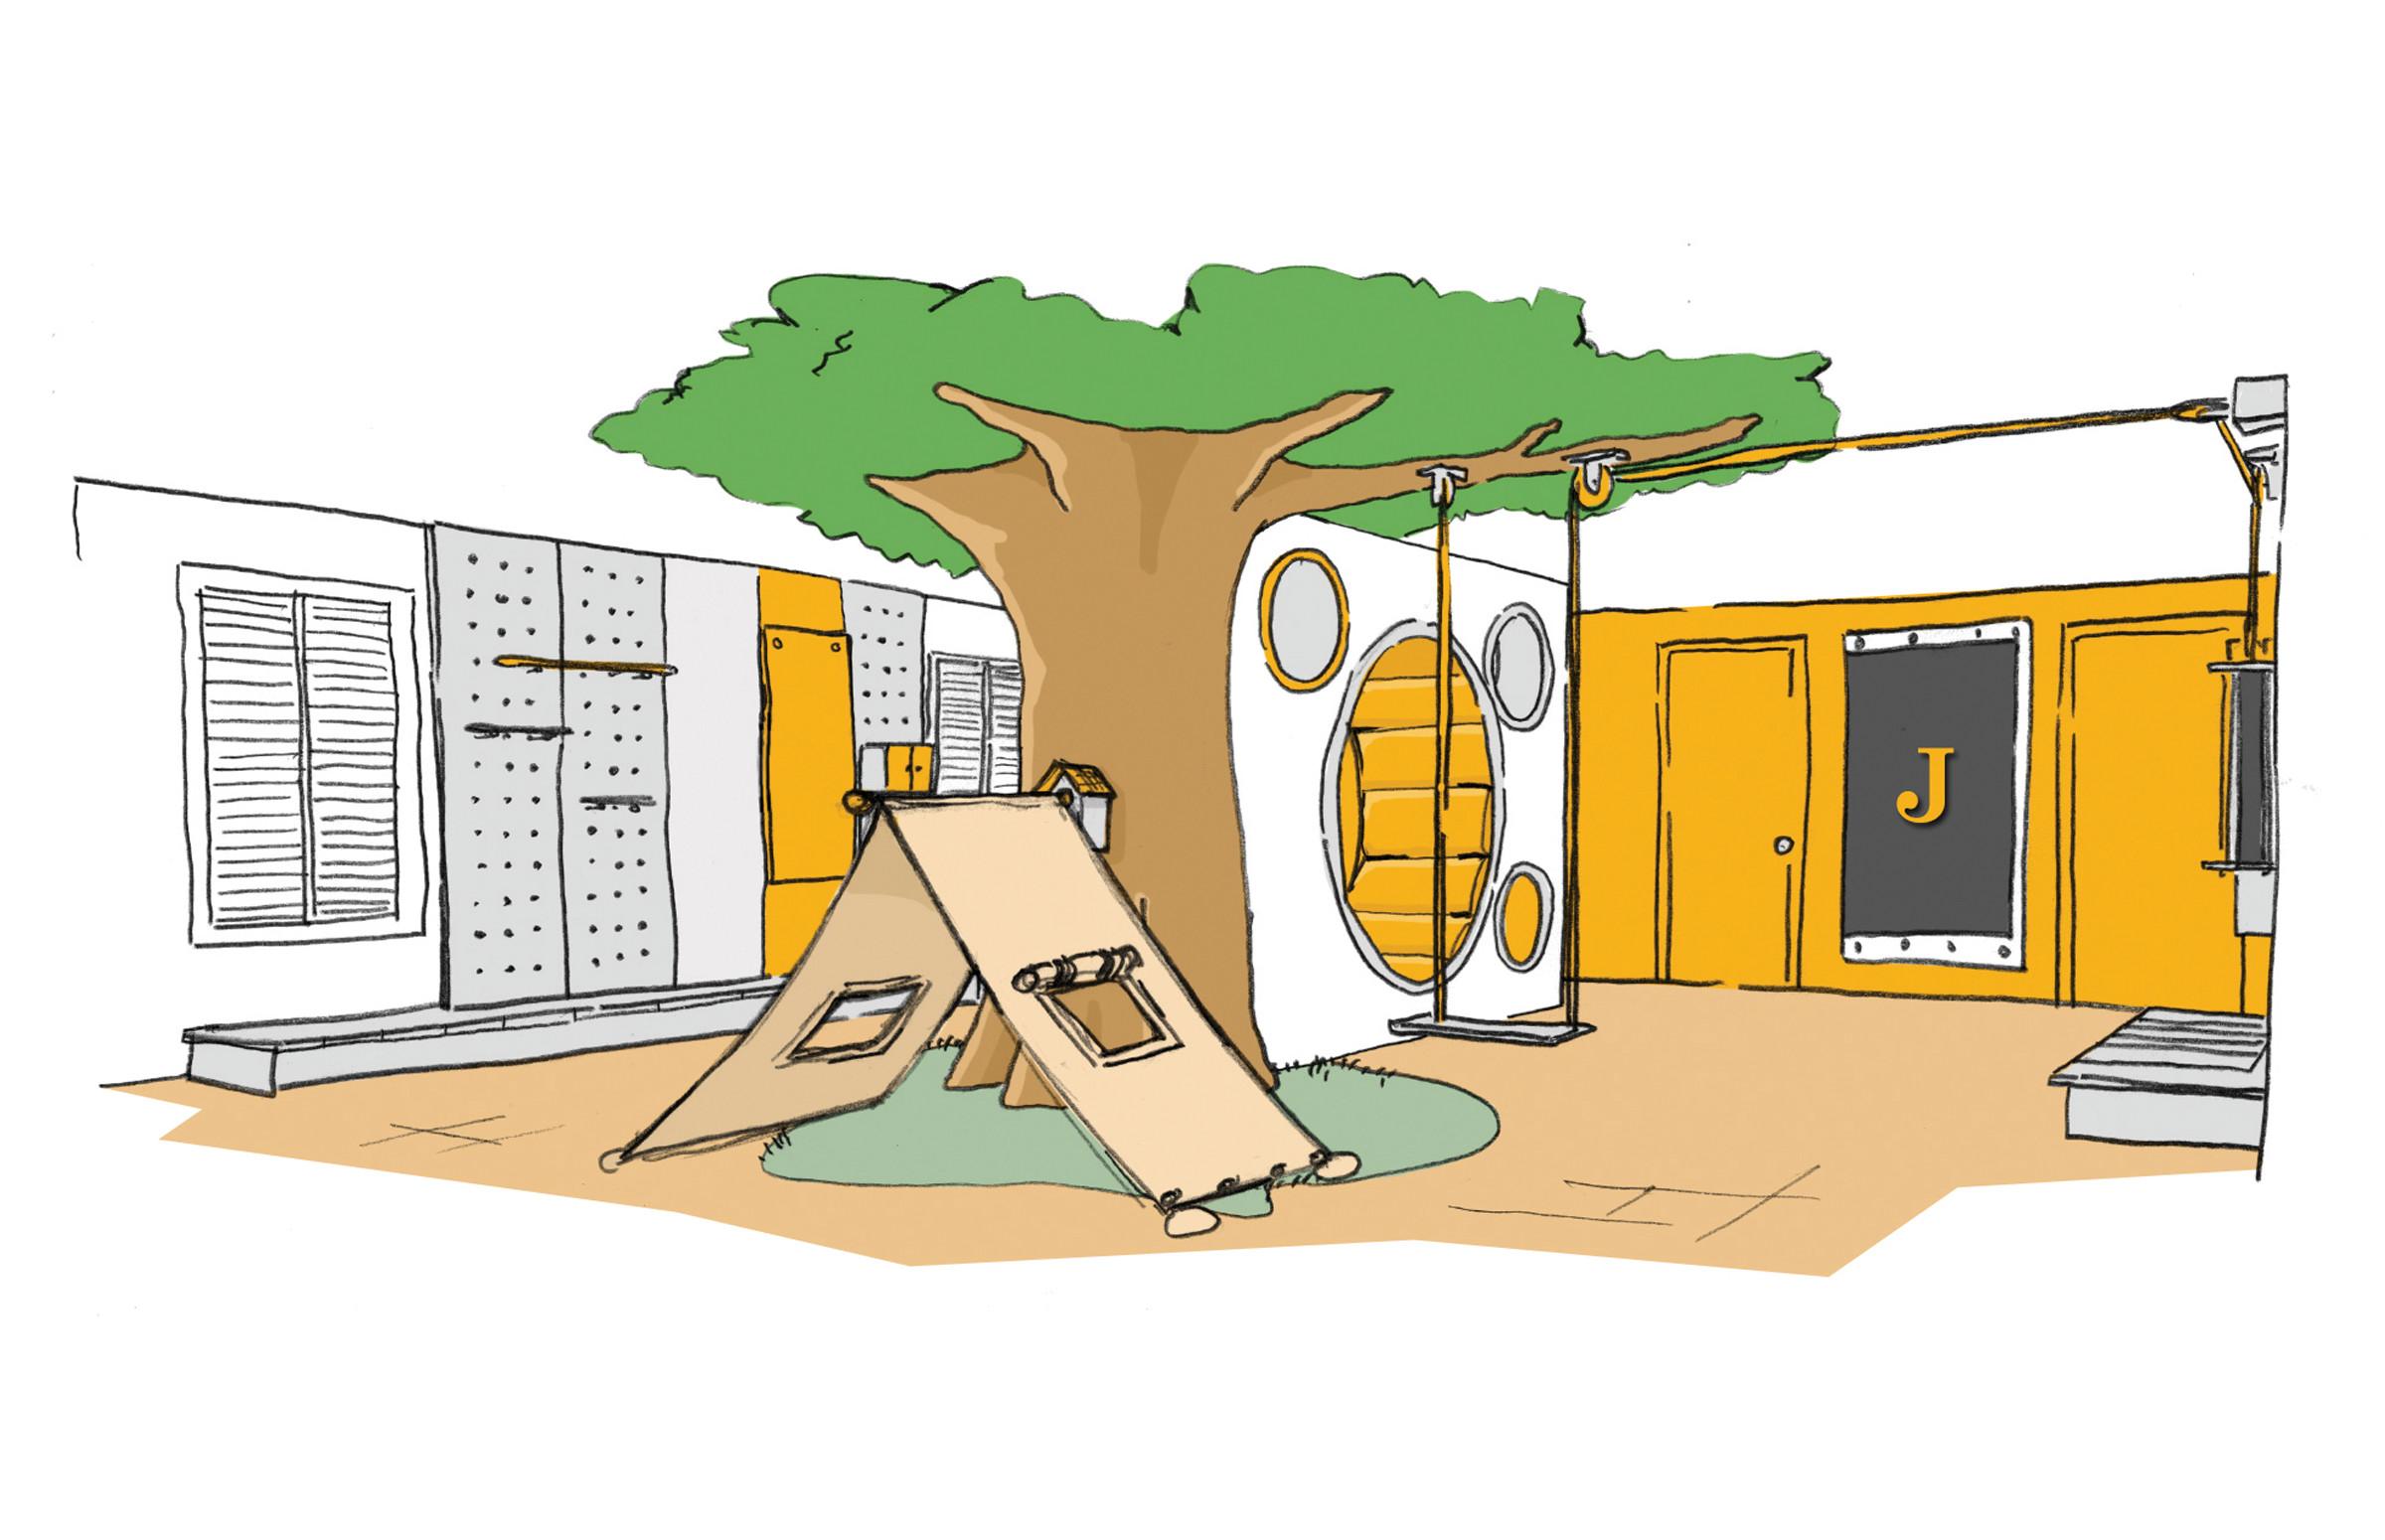 kids-room-sketch-art-tent-thinkterior.jpg